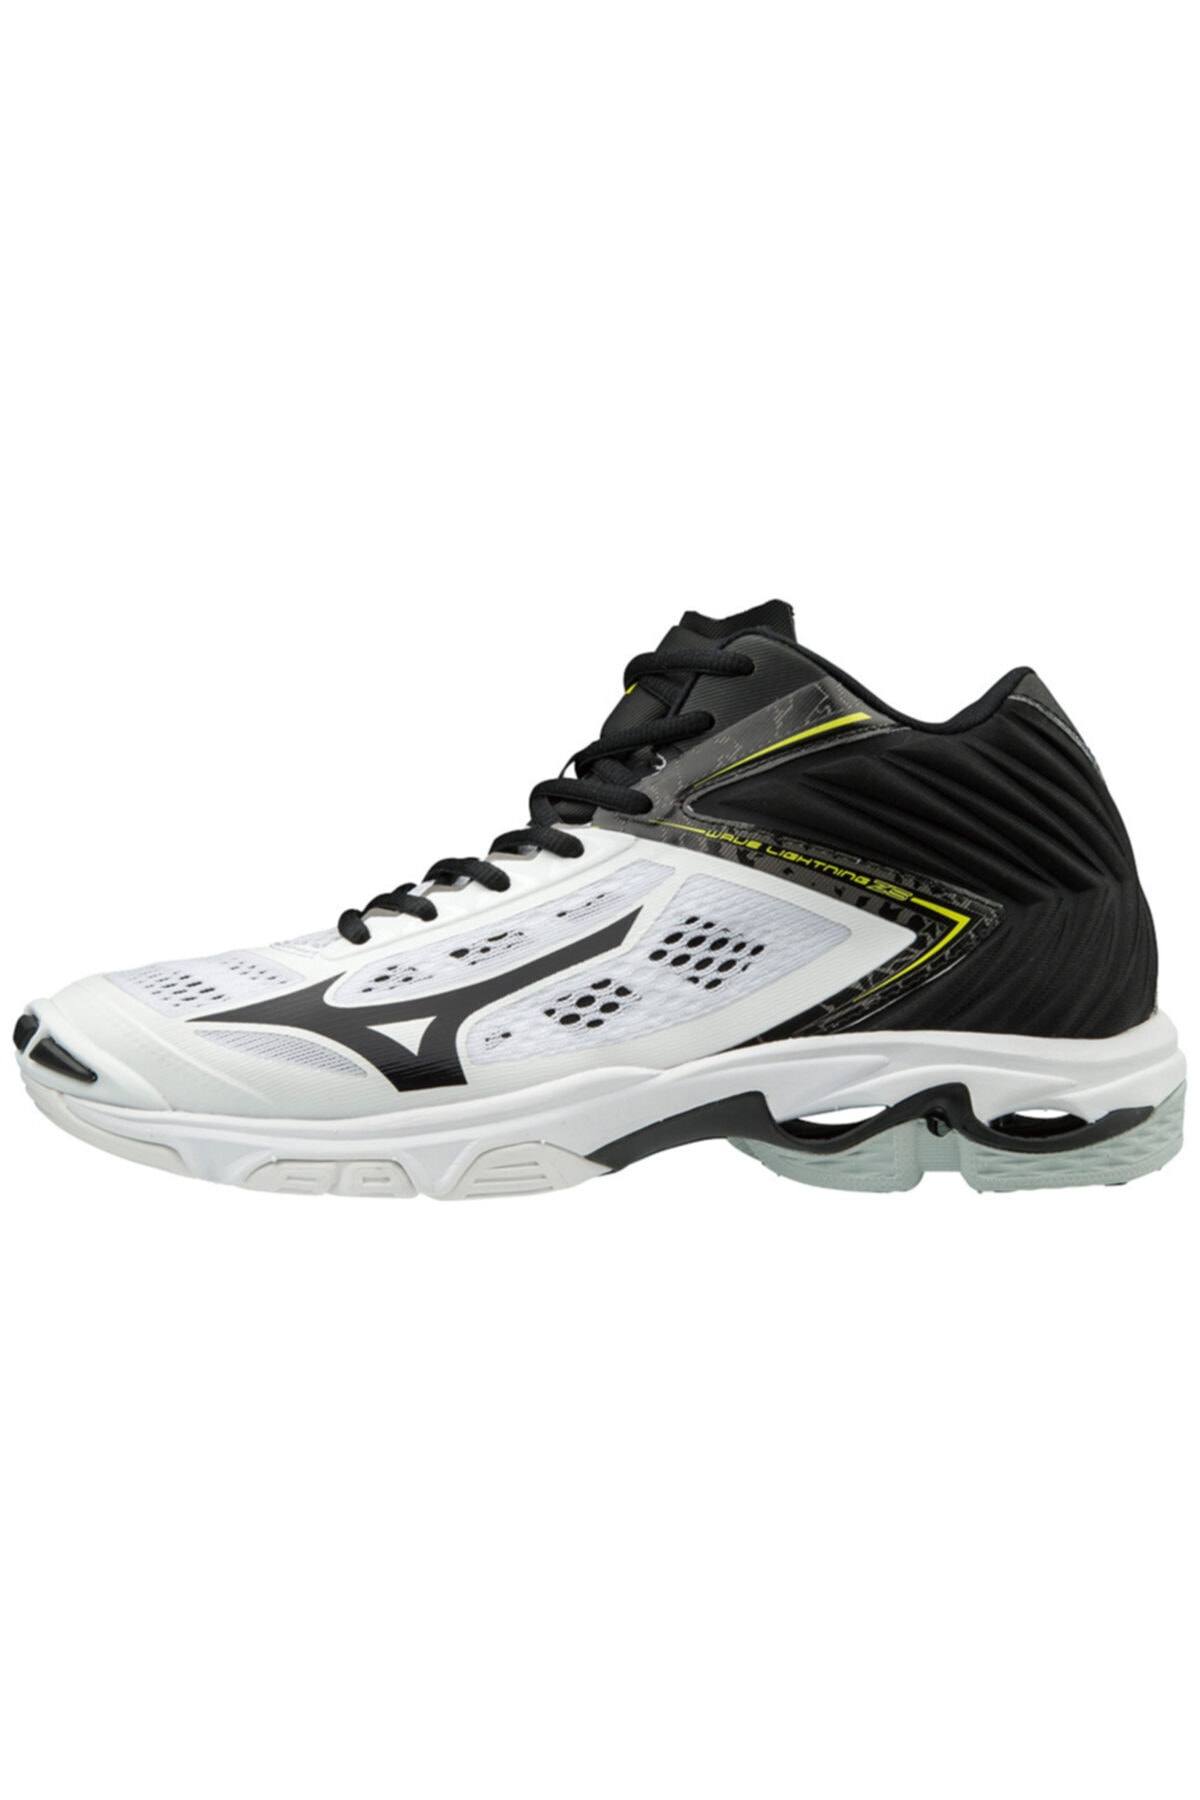 MIZUNO Wave Lightning Z5 Mıd Voleybol Ayakkabısı V1ga190509 1